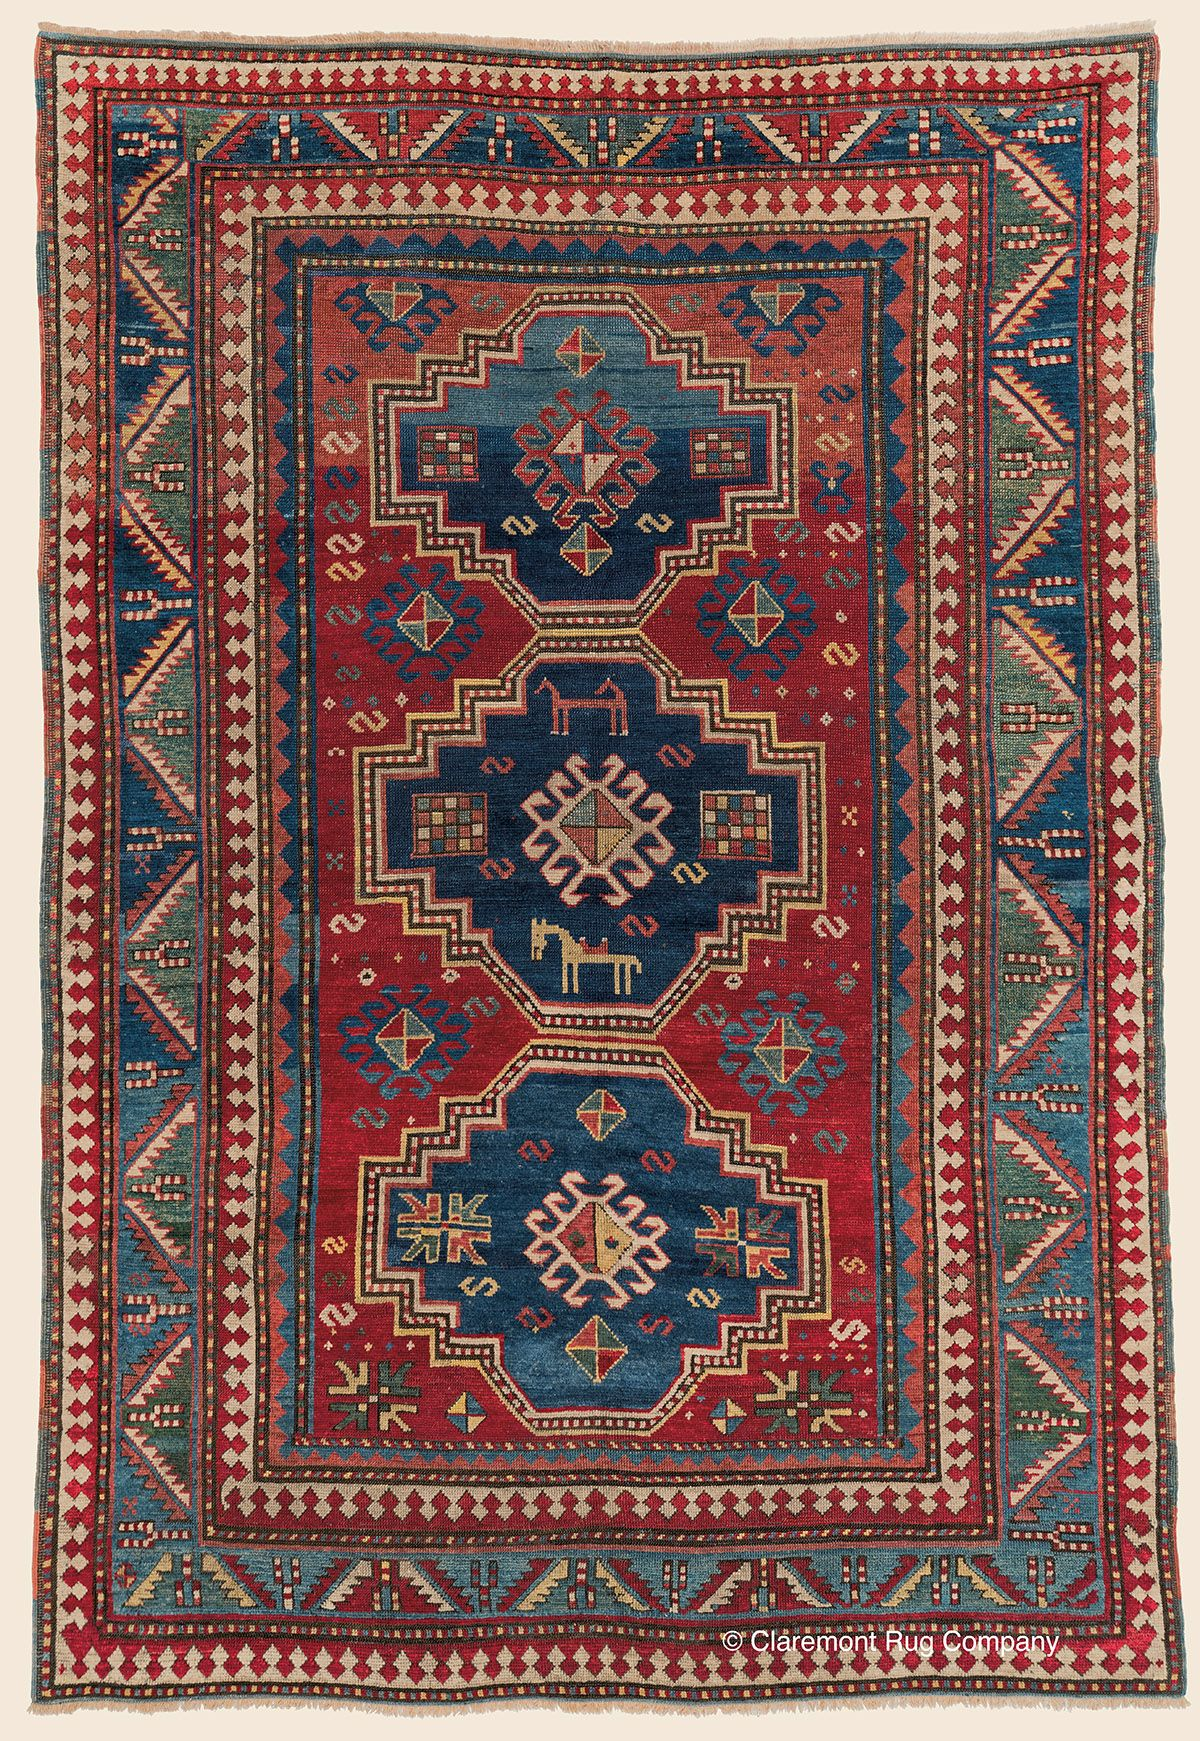 Three Medallion Fachralo Kazak 5 4 X 7 10 3rd Quarter 19th Century Southern Central Caucasi Rugs On Carpet Antique Persian Carpet Claremont Rug Company